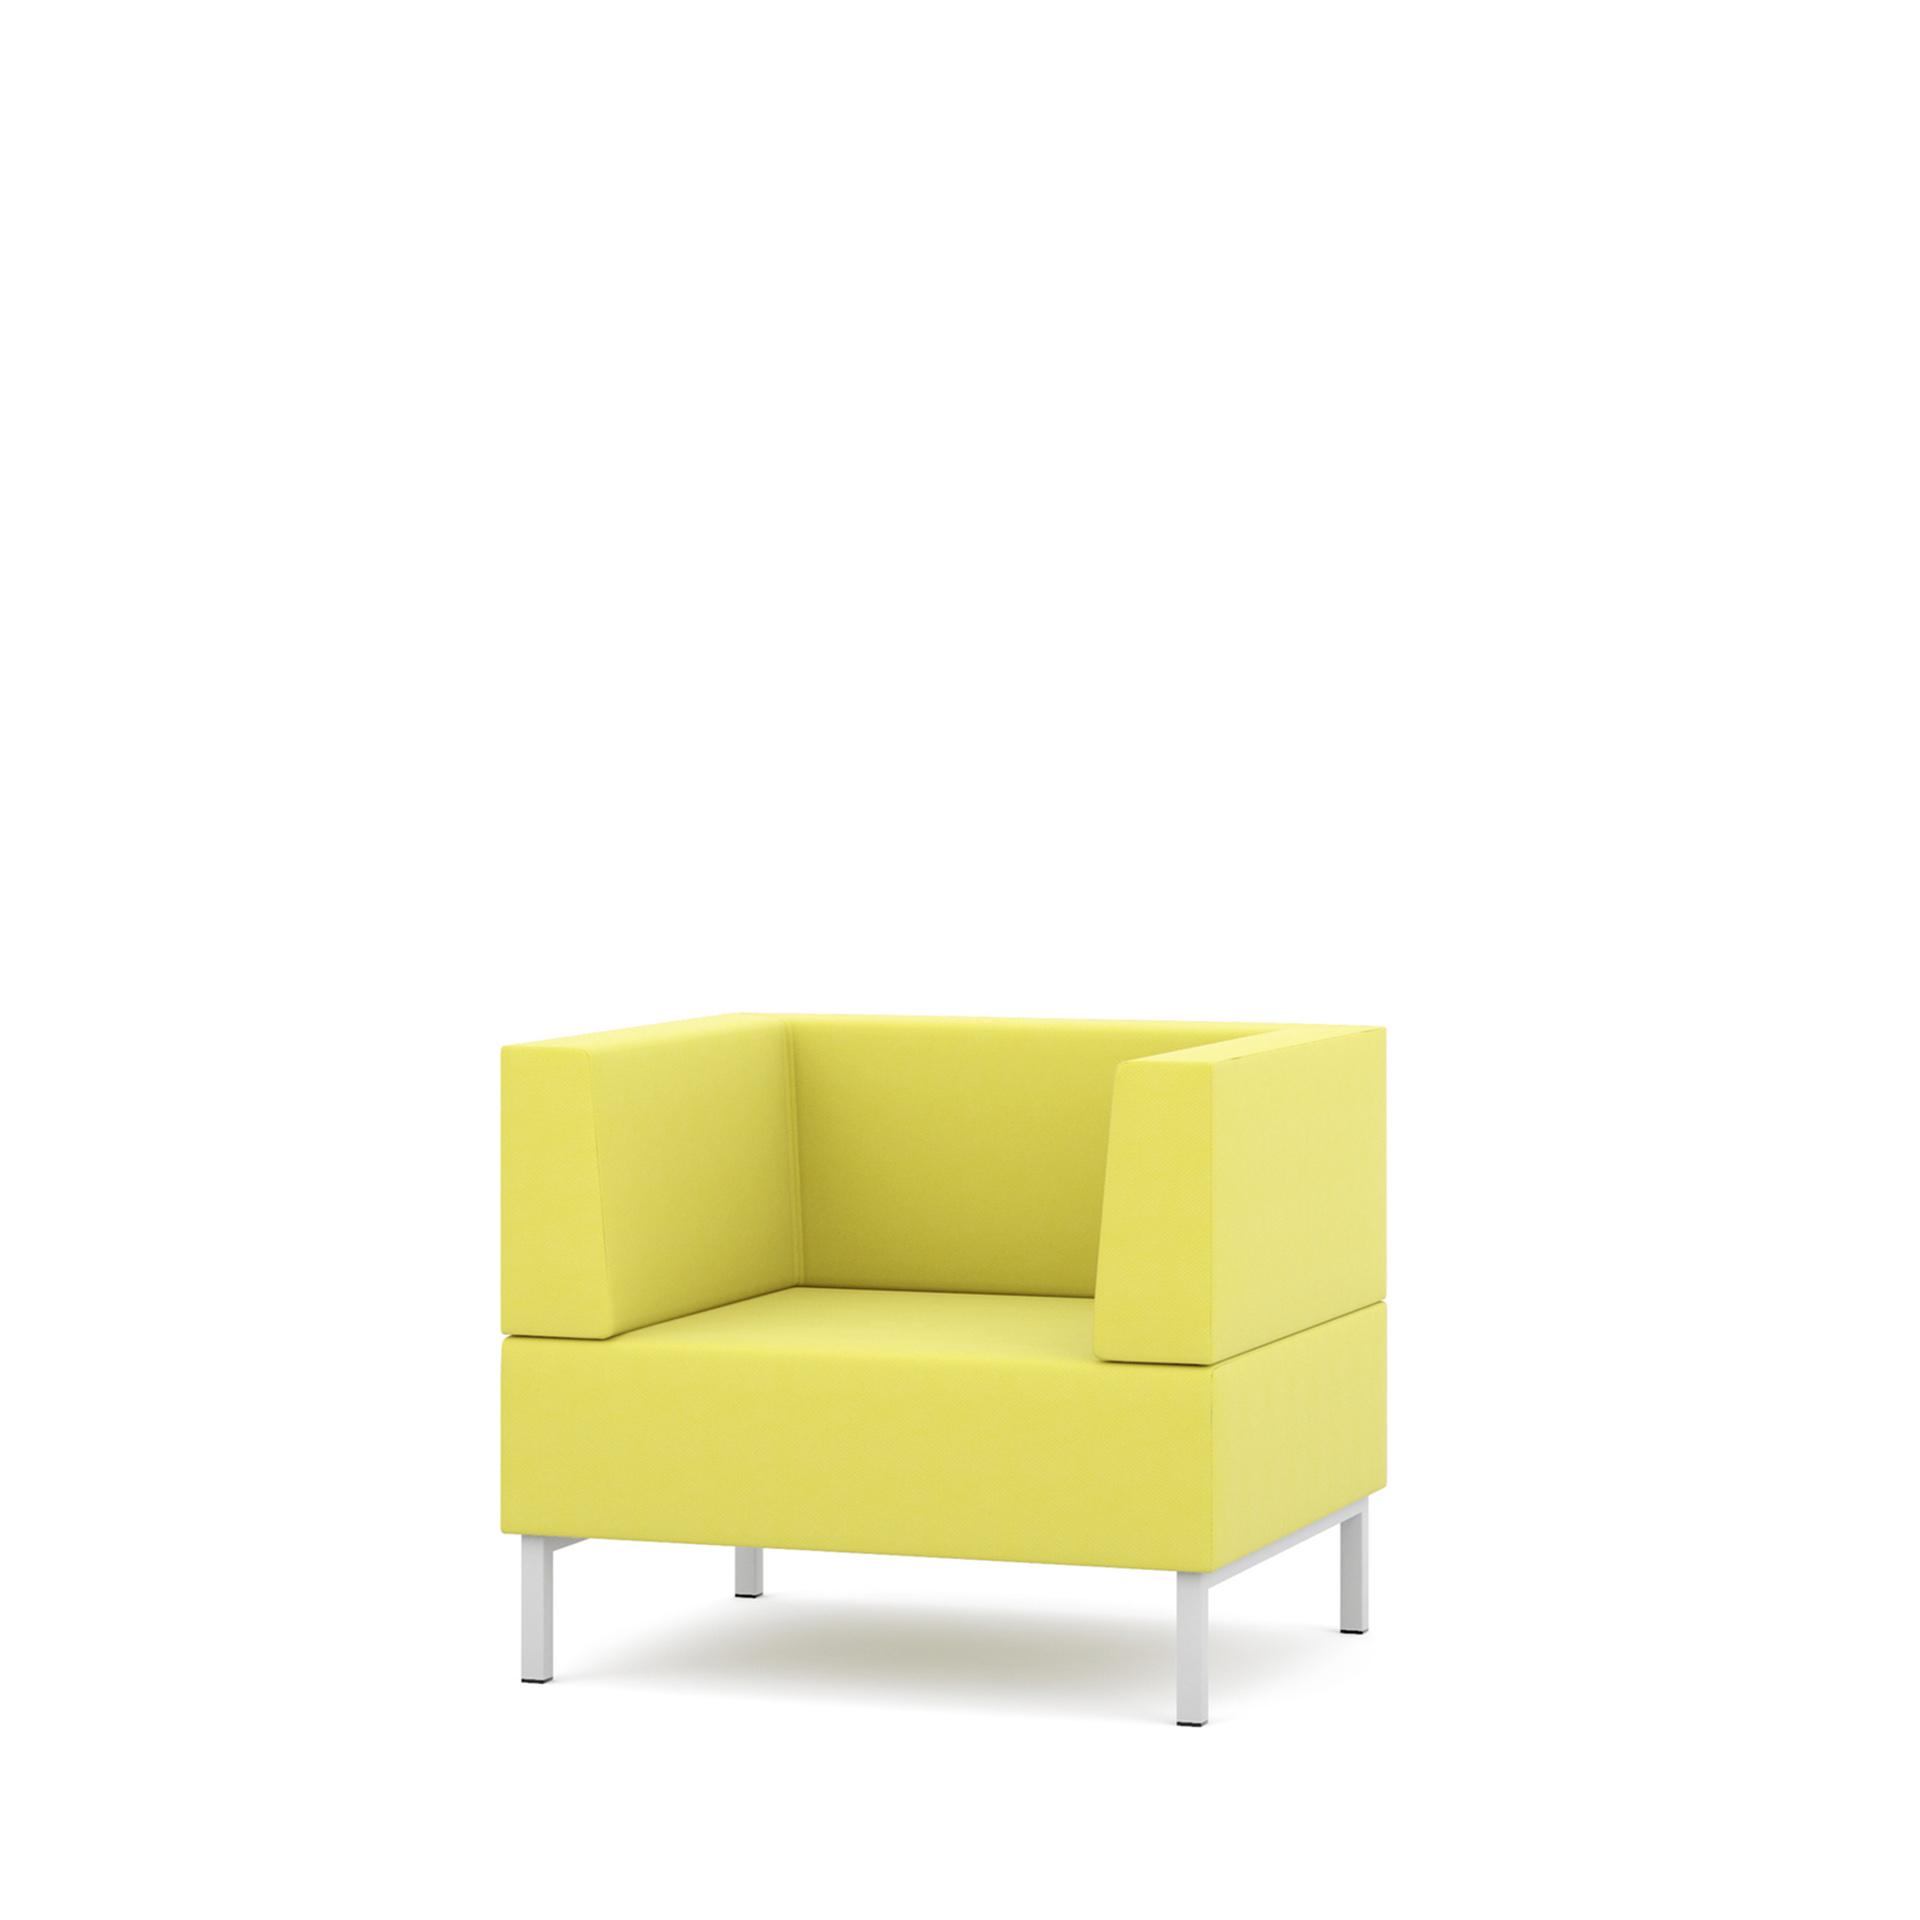 Breakout Furniture Single Seat